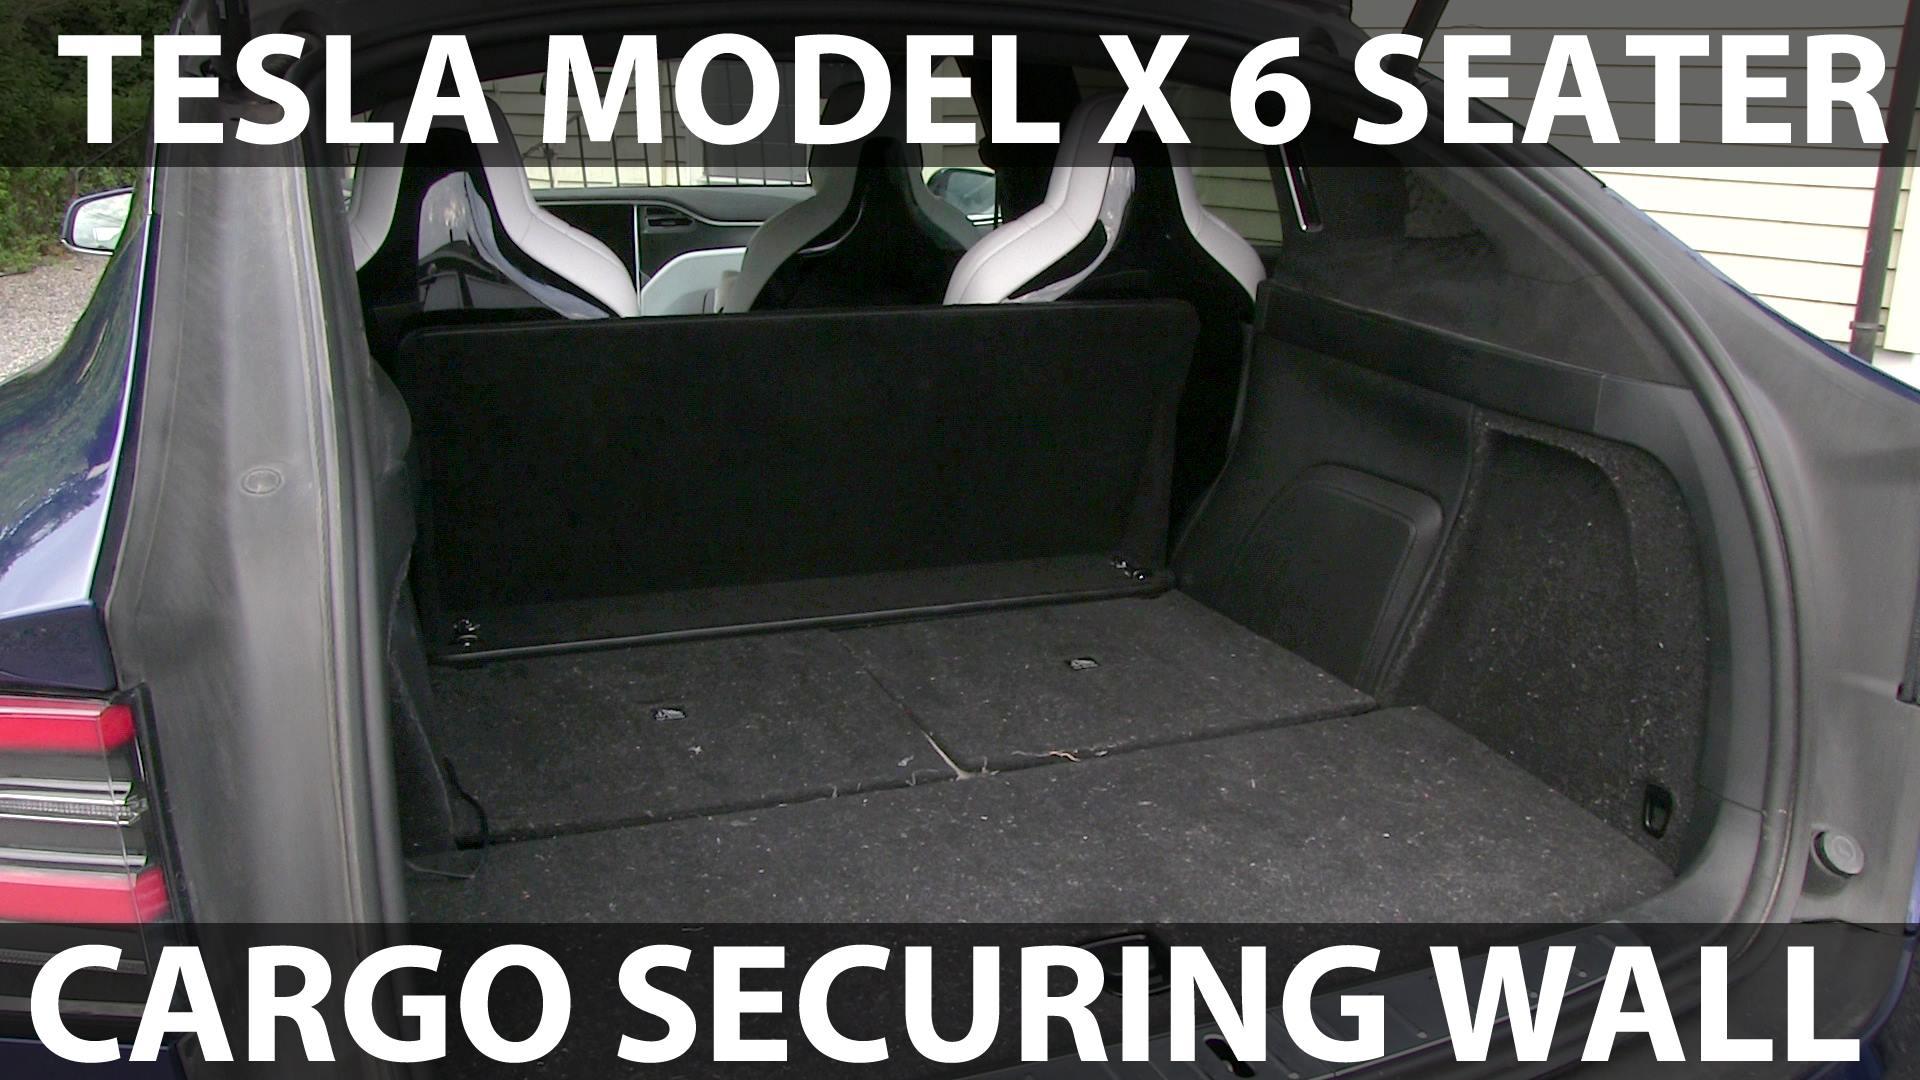 tesla-model-x-cargo-space